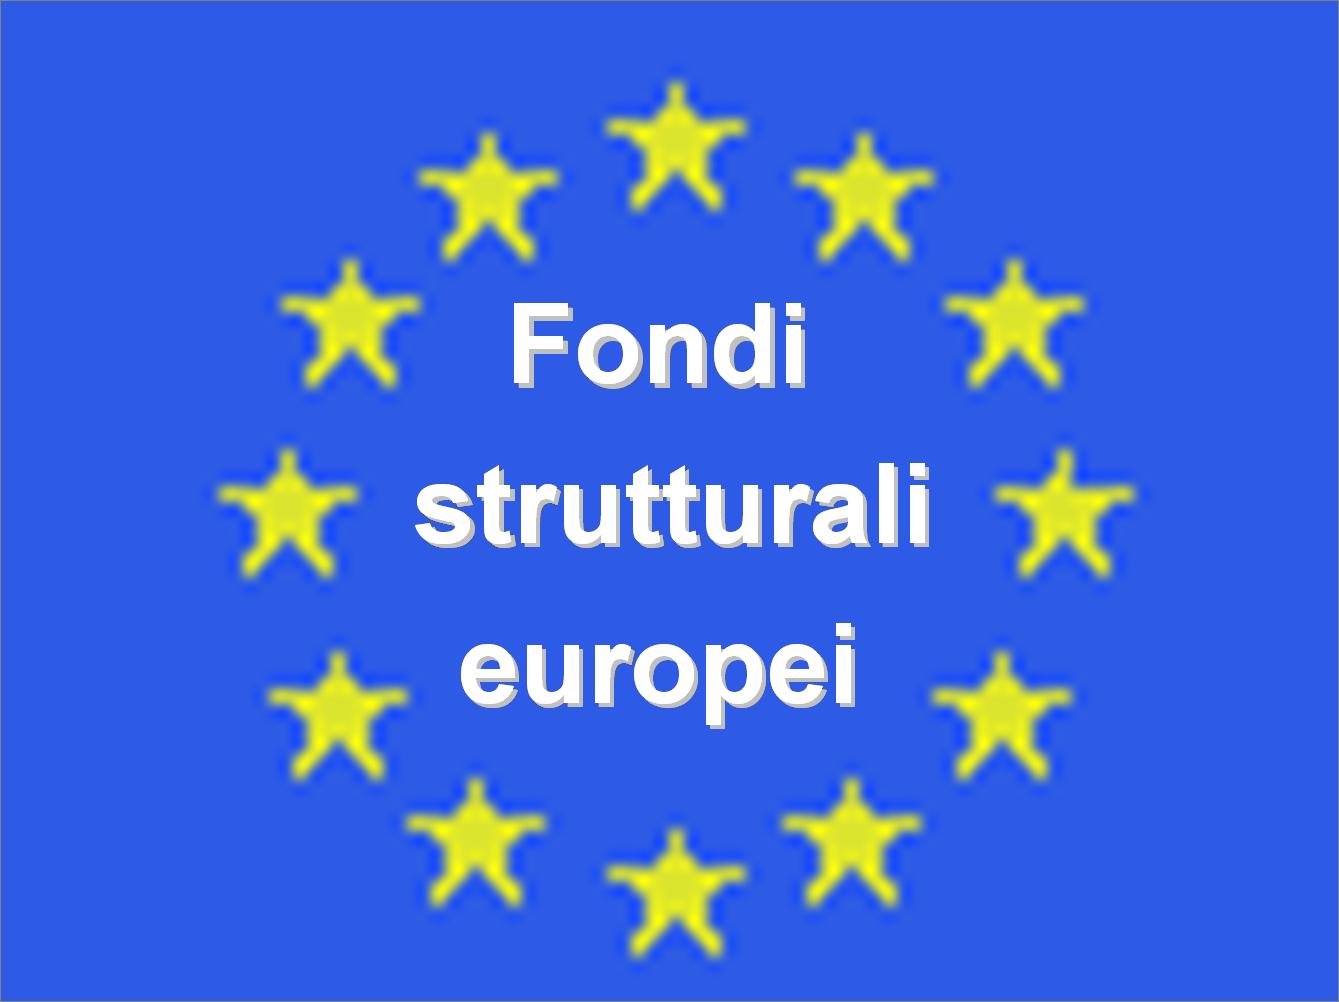 fondi-strutturali-europei.png